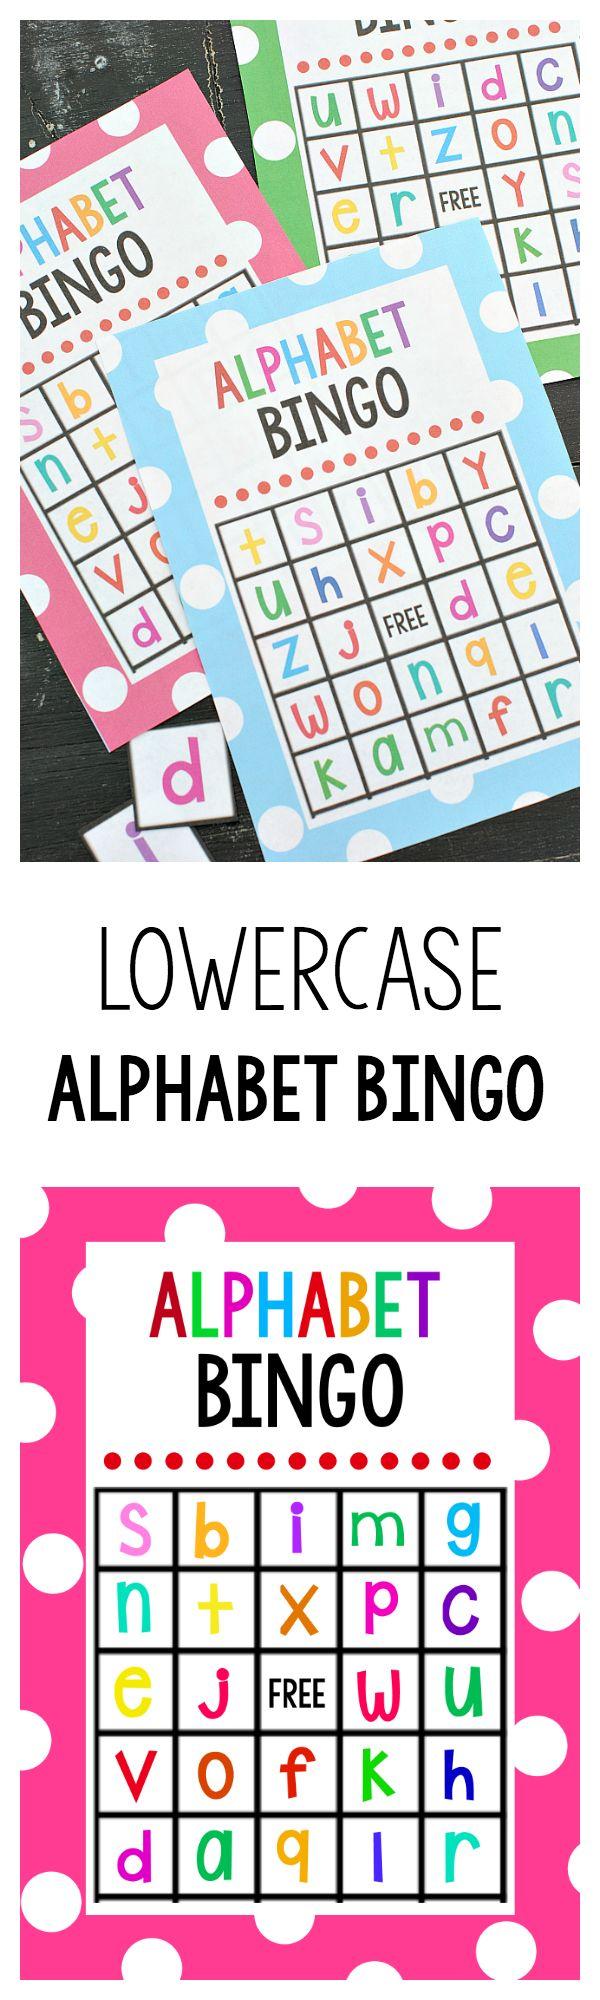 Lowercase Alphabet Bingo Game Bingo, Game and Alphabet